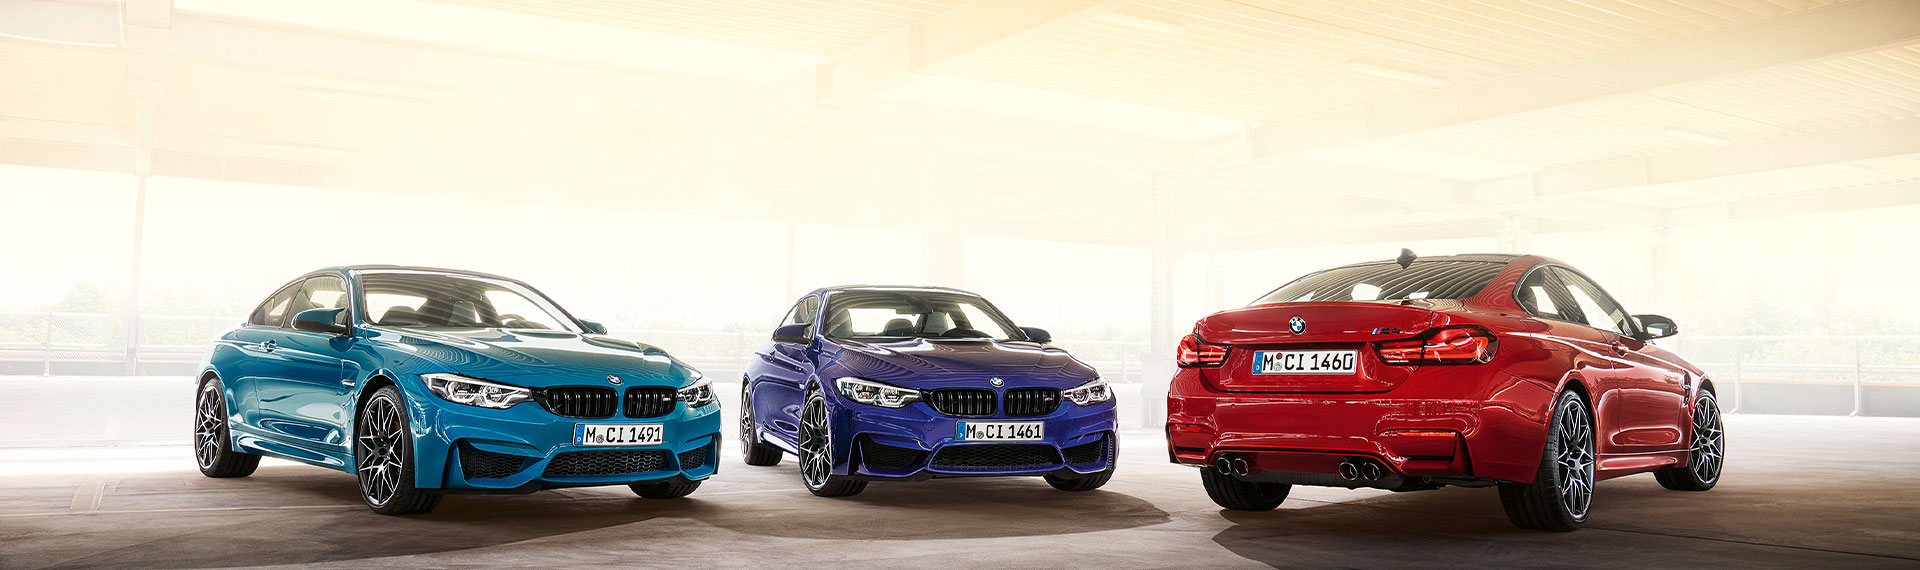 New BMW M4 Coupé /// M Heritage Edition